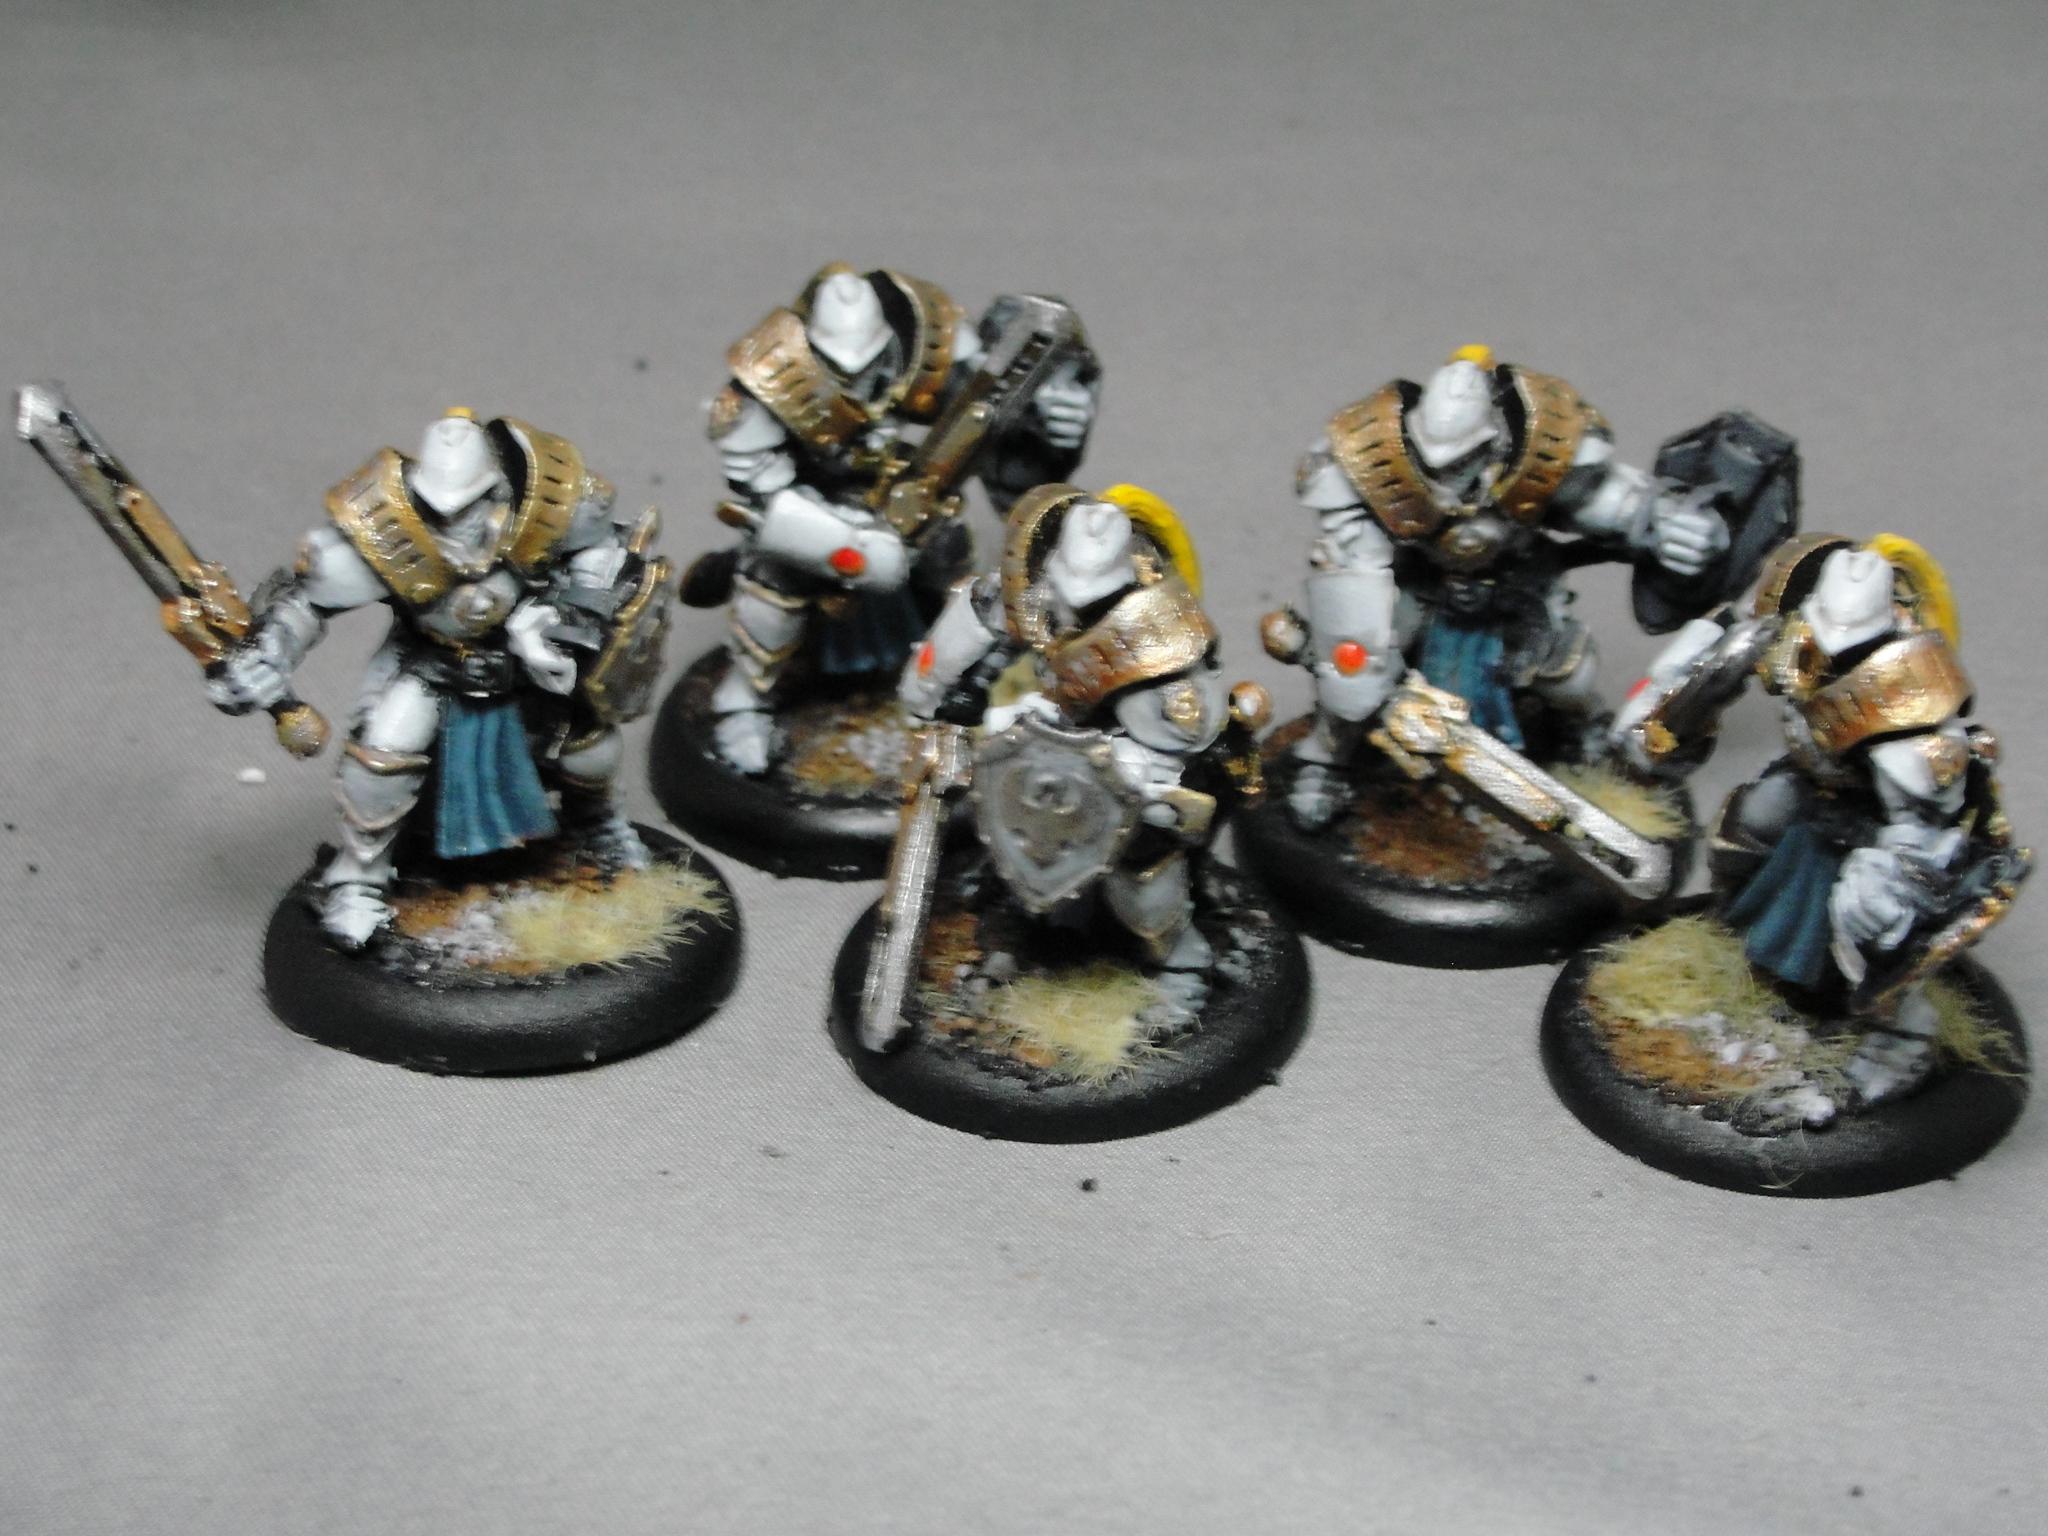 Warmachine, Cygnar, Sword Knights